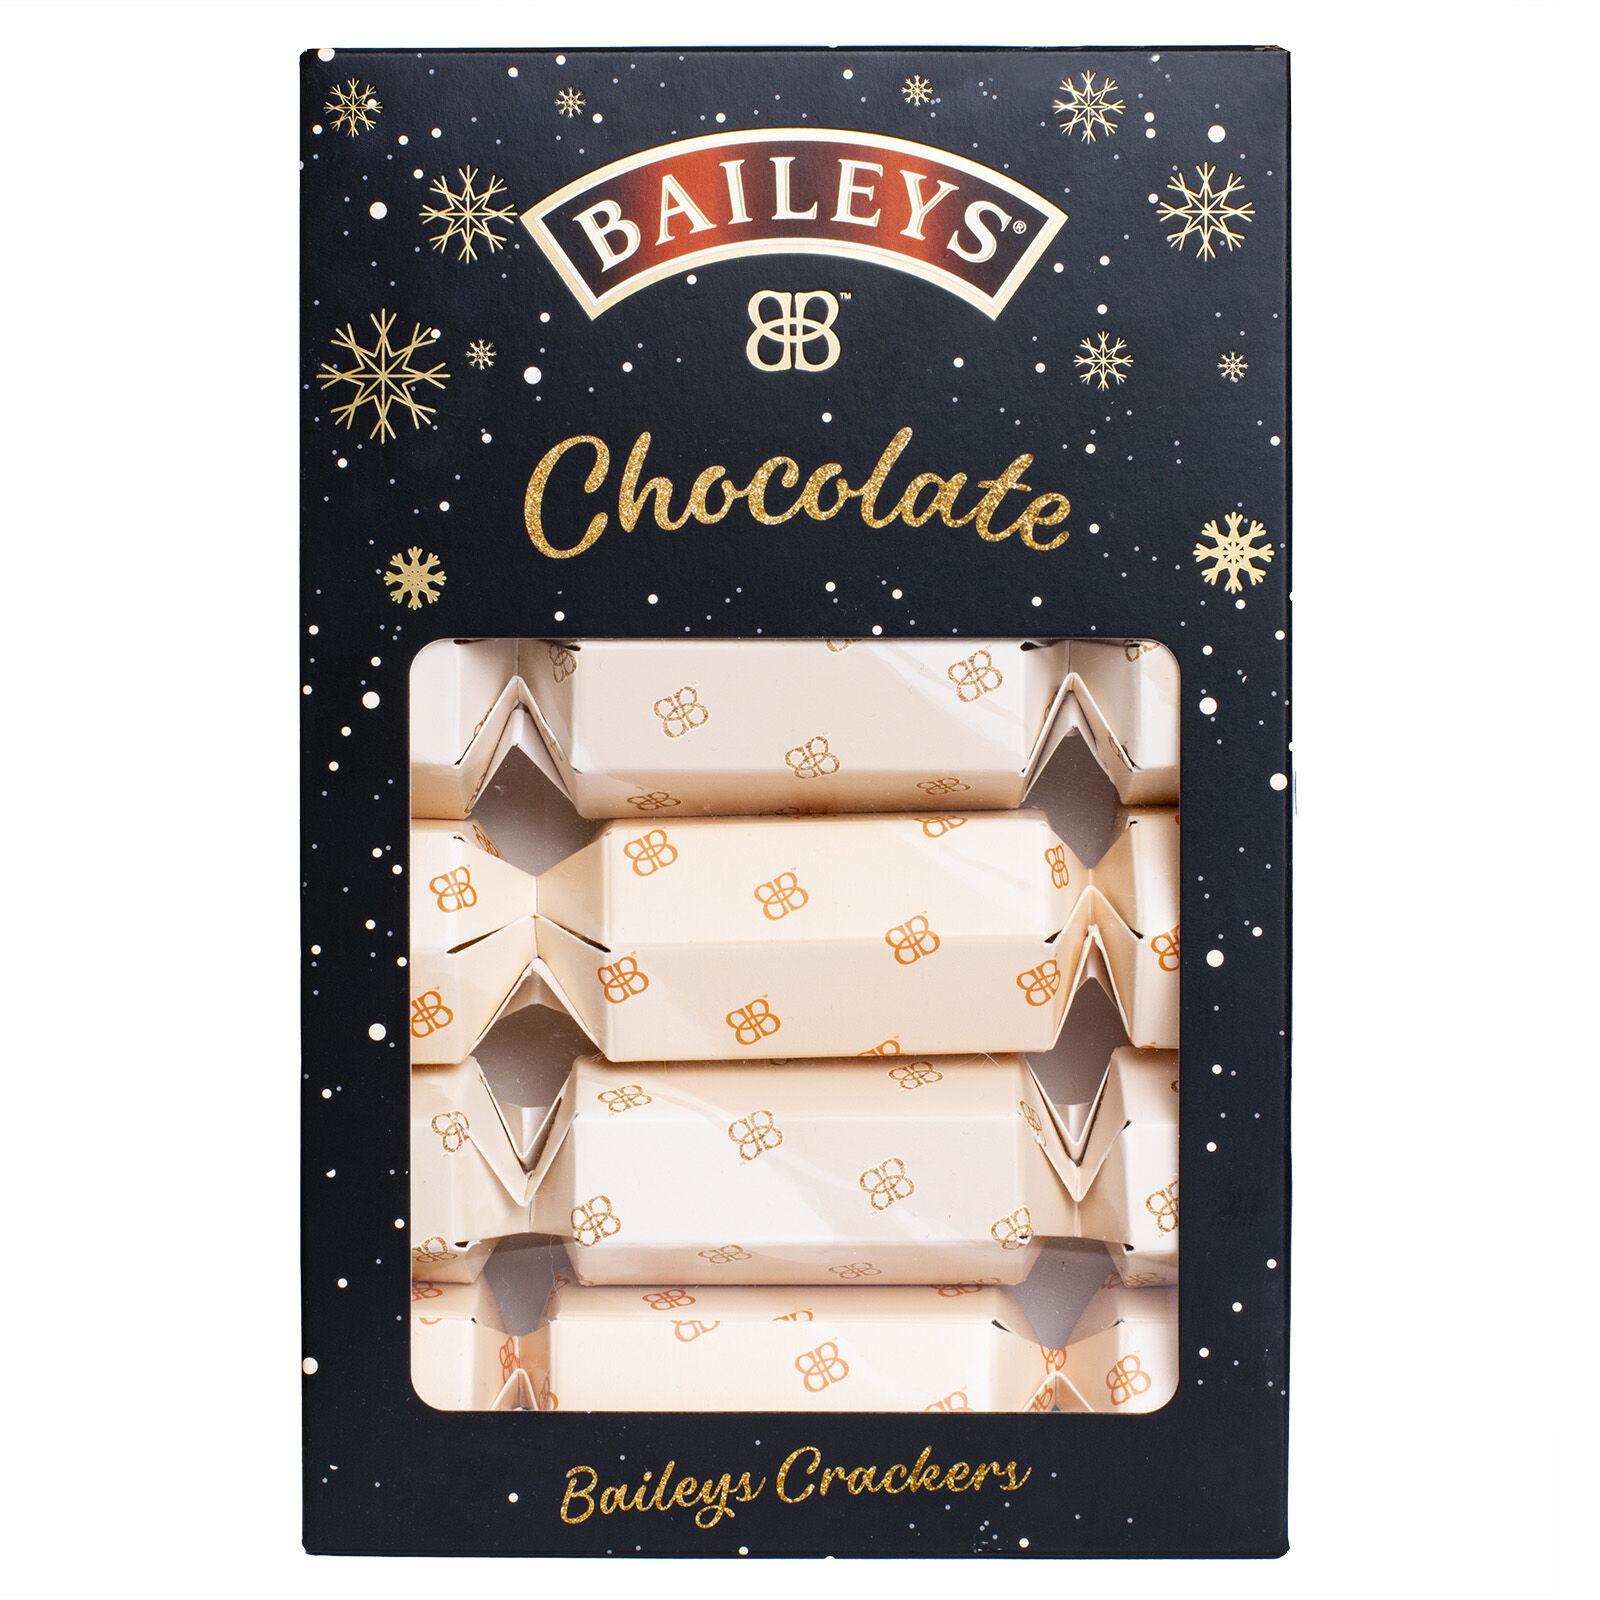 Buy Six Pack Of Baileys Christmas Crackers With Milk Chocolate Truffles 135g Carrolls Irish Gifts